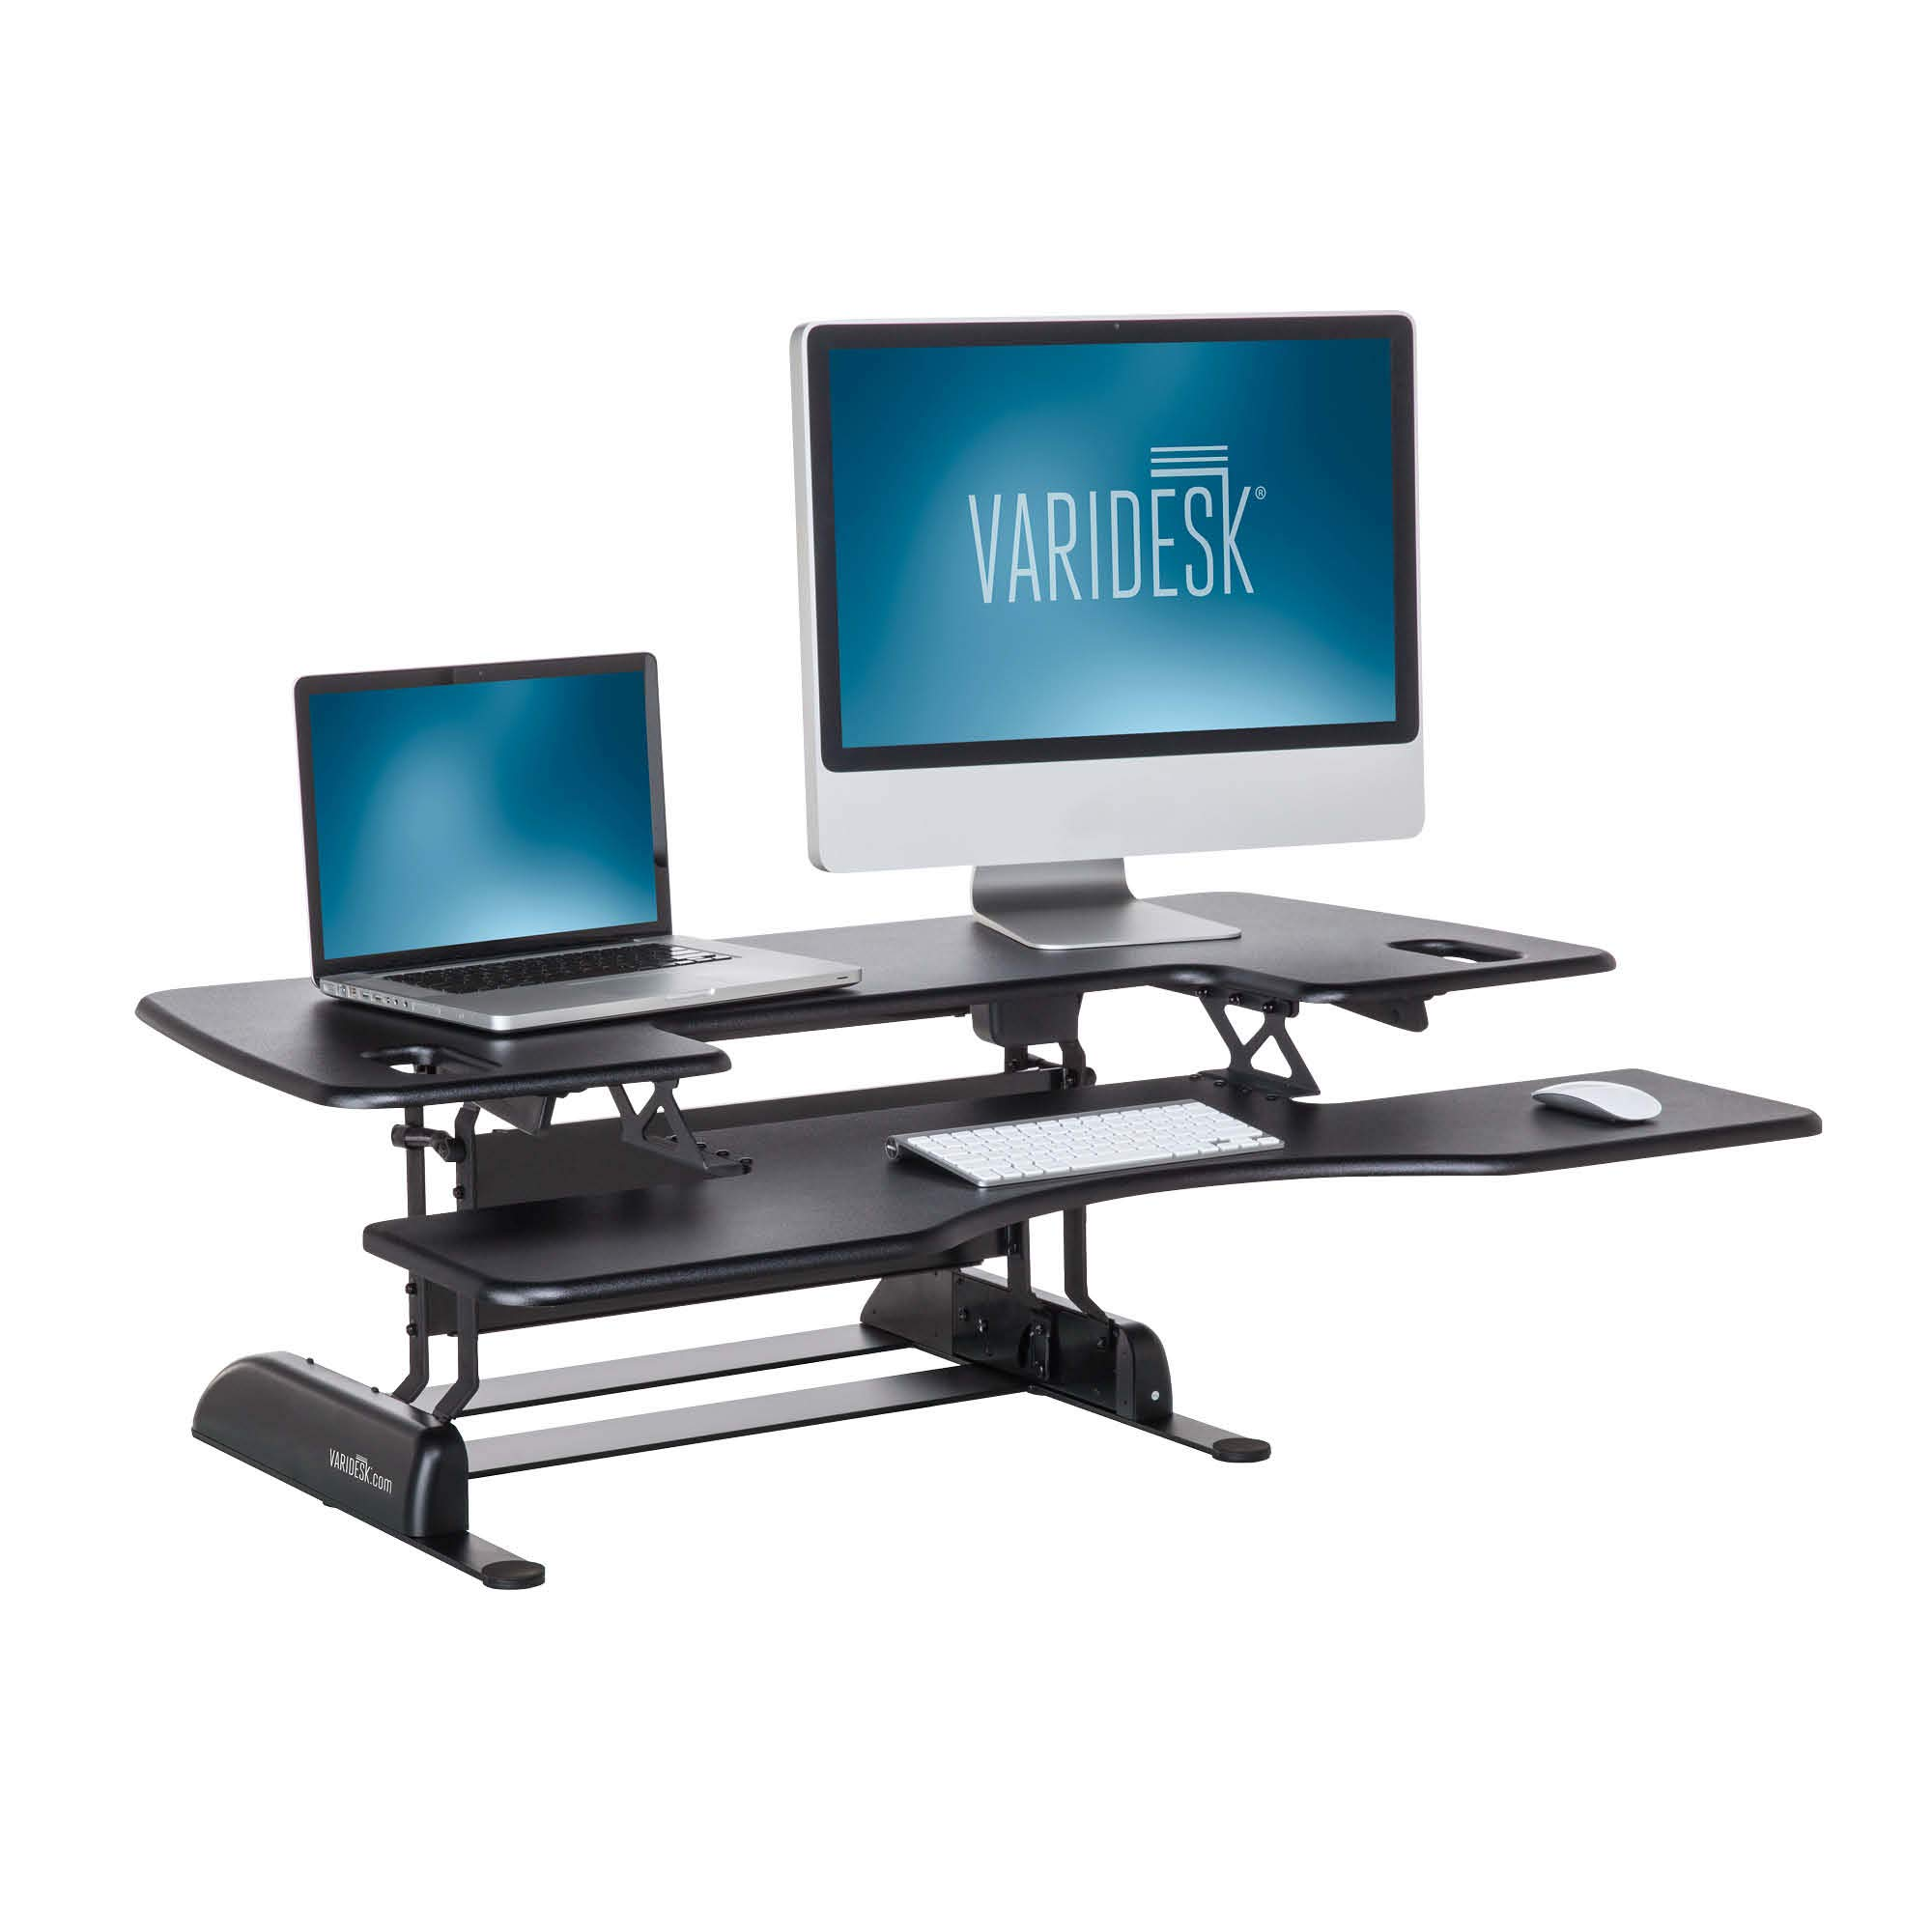 VARIDESK - Height Adjustable Standing Desk Converter - ProPlus 48 - Stand Up Desk for Dual Monitors - Black by VARIDESK